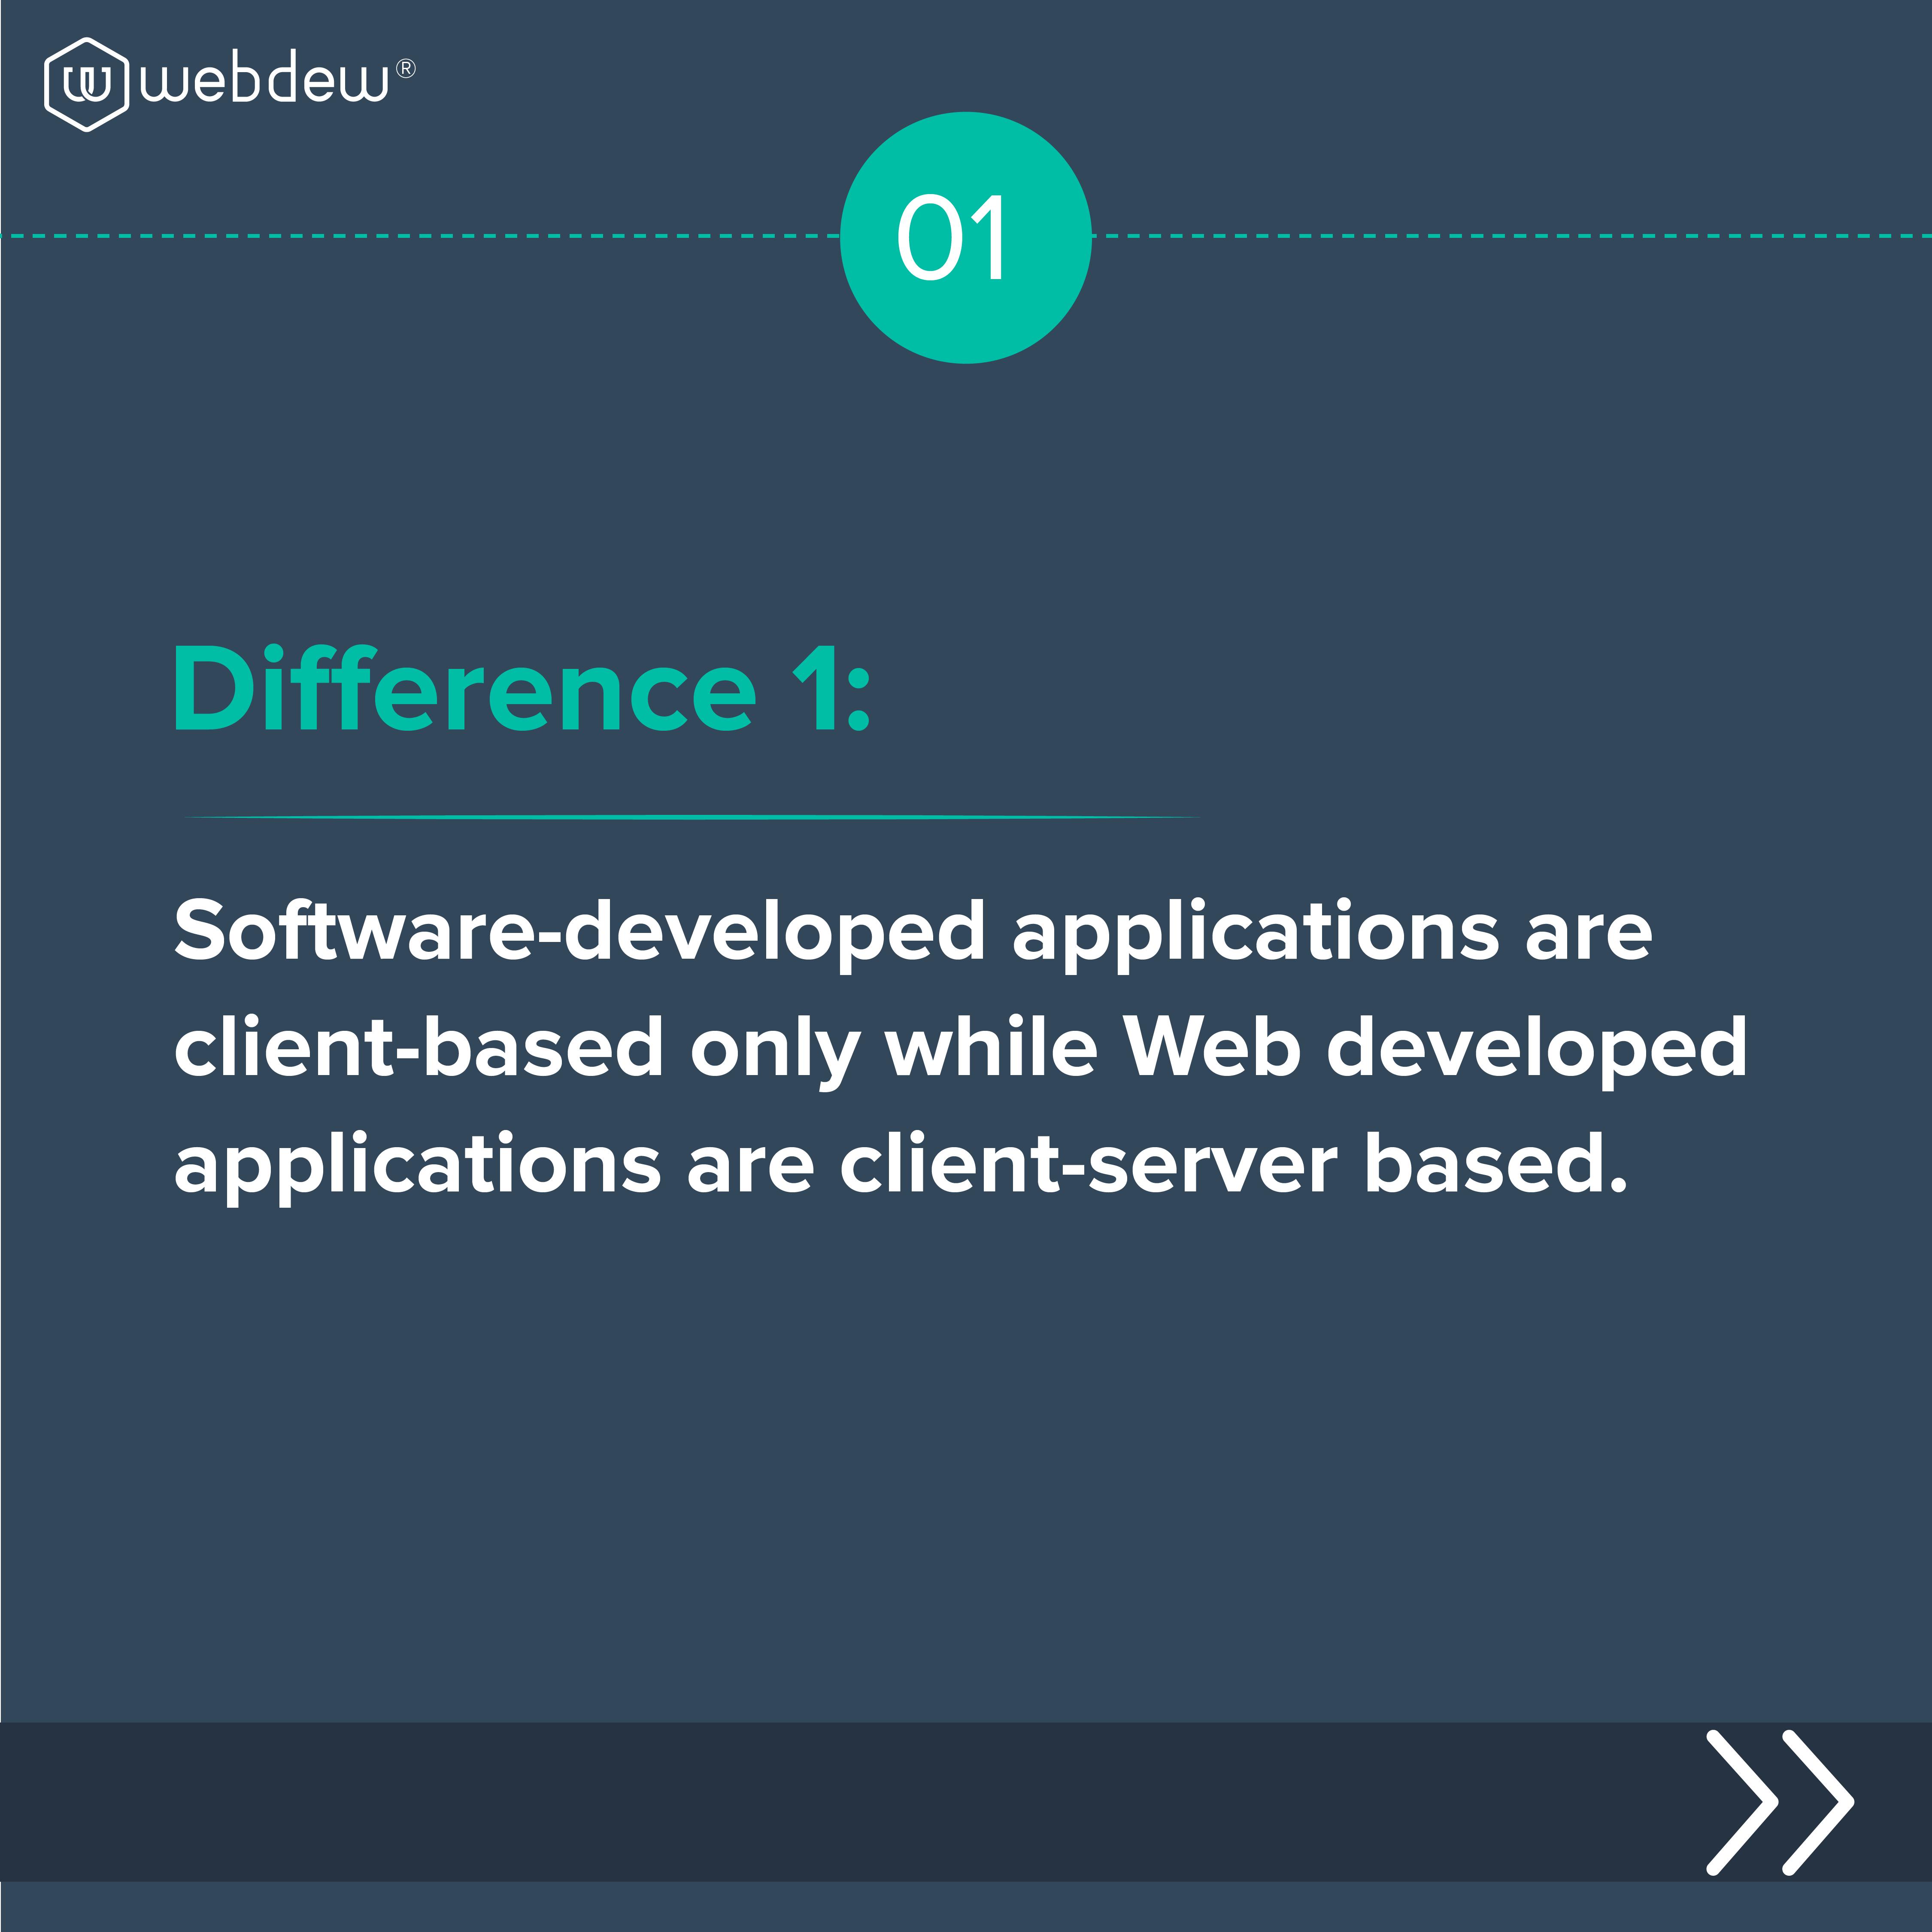 web-development-vs-software-development-difference-one